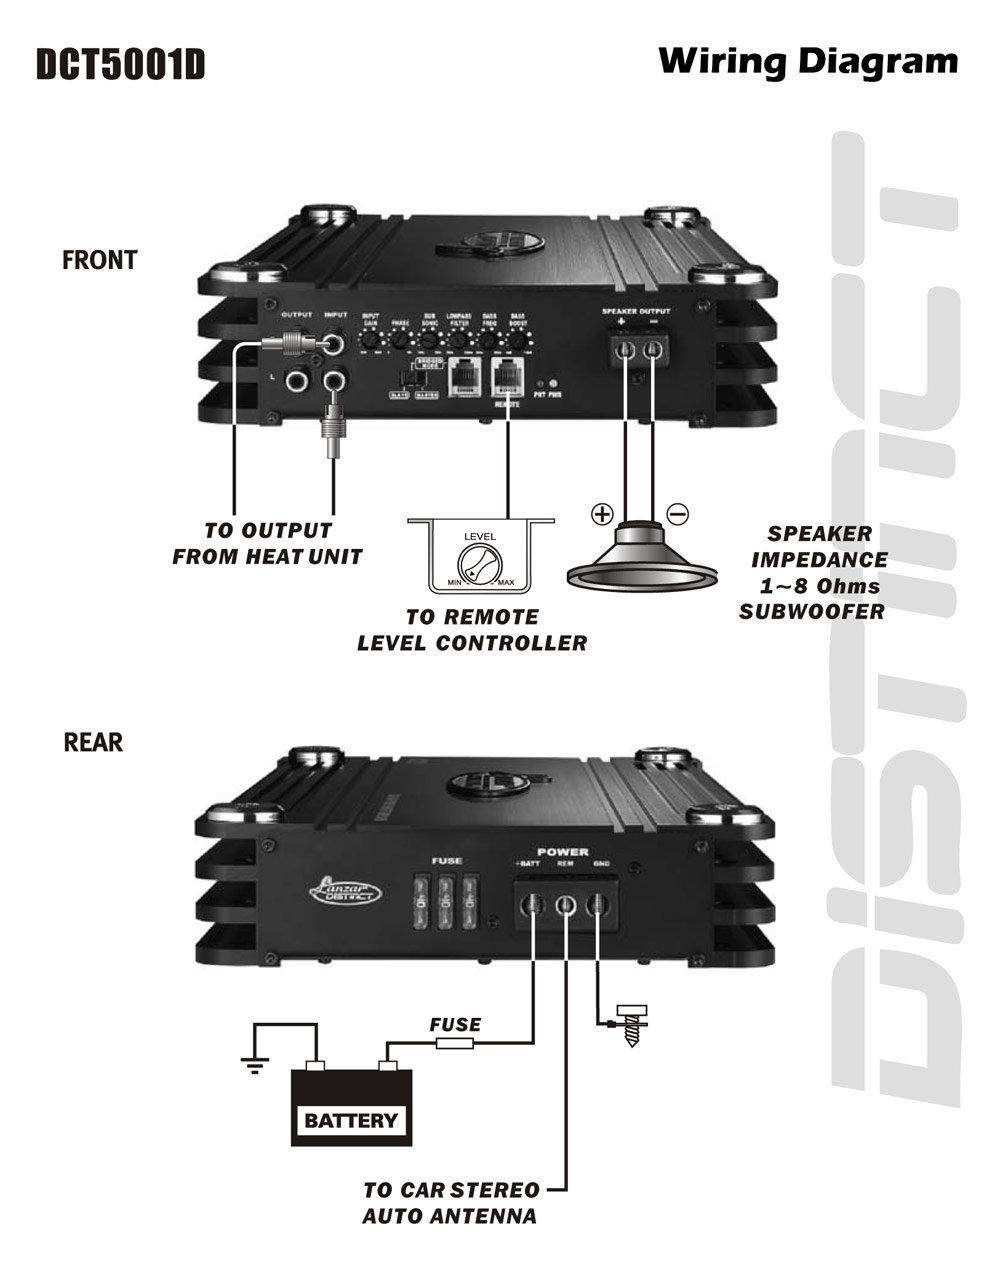 How To Tune A Car Amp : DIAGRAM], Wiring, Diagram, Amplifier, Version, Quality, DIAGRAMOFCHART.DEMOCRATICIPERILNO.IT